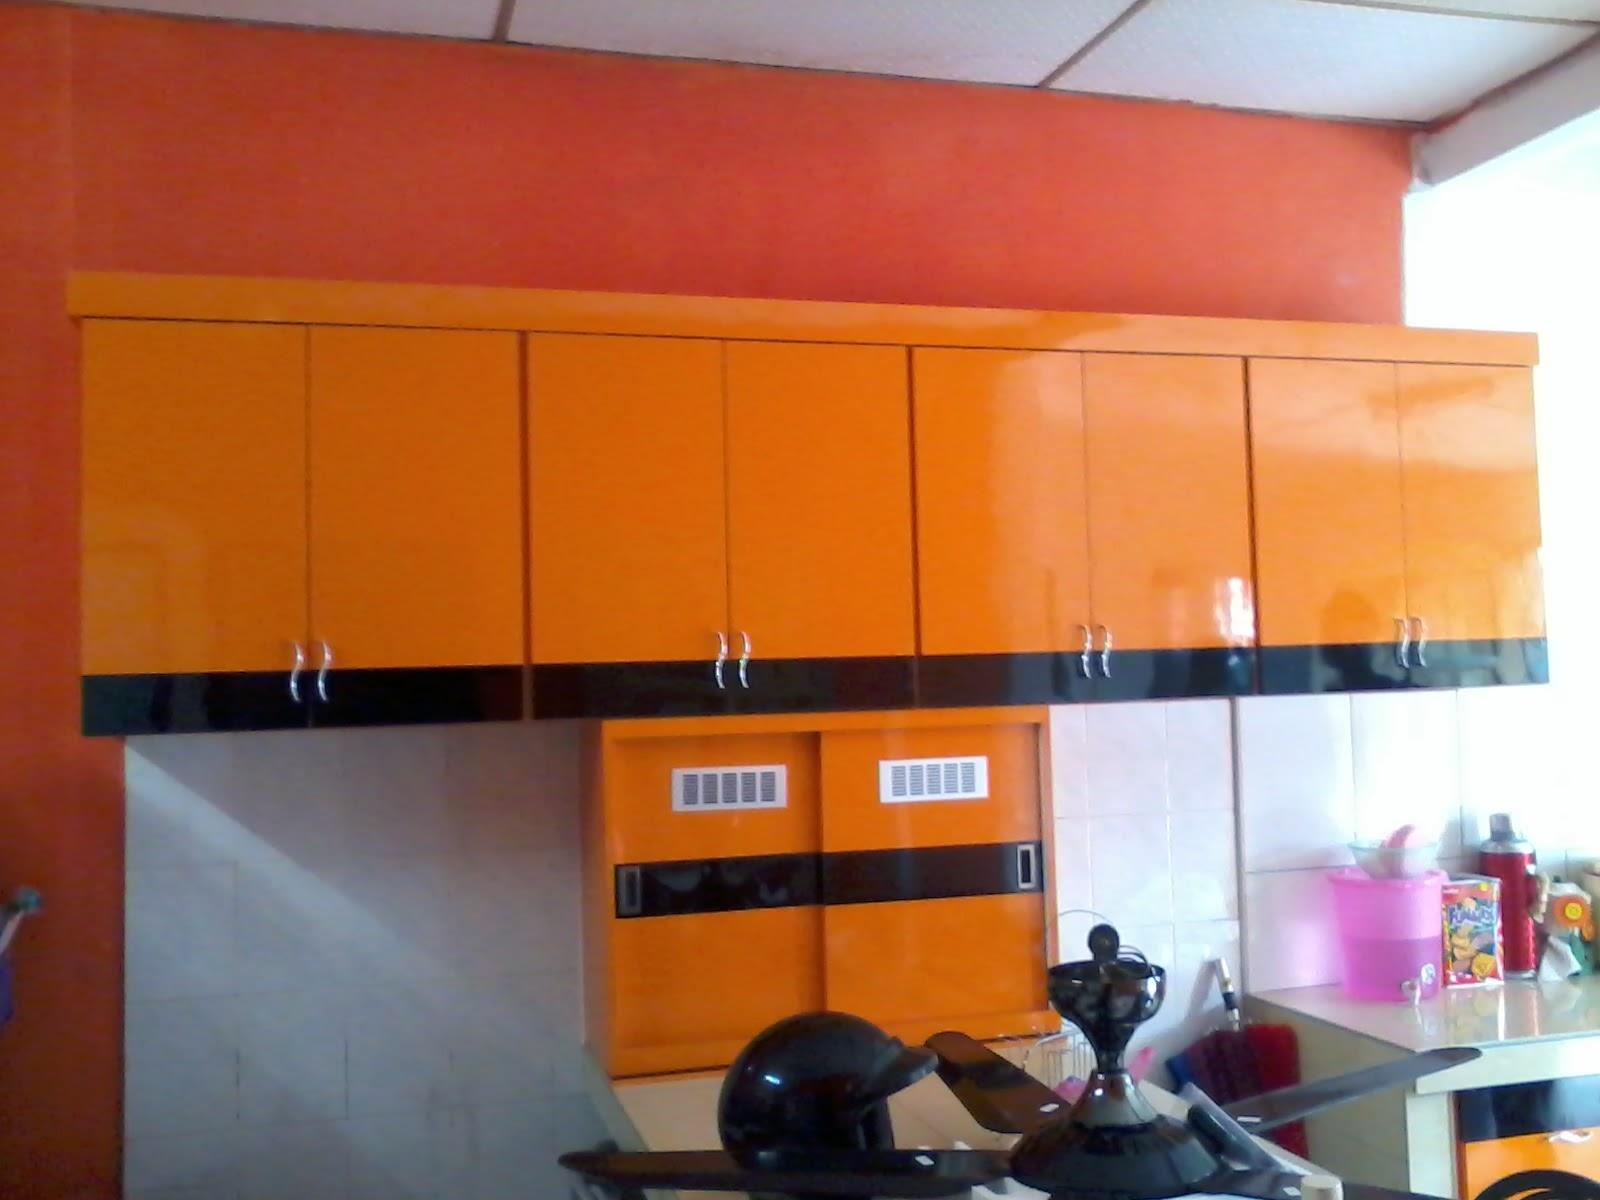 Kabinjet Dapur Di Bahagian Bawah Yang Ditempah Seri Manjung Perak Dengan Menggunakan Warna Oren Gloss Dan Hitam